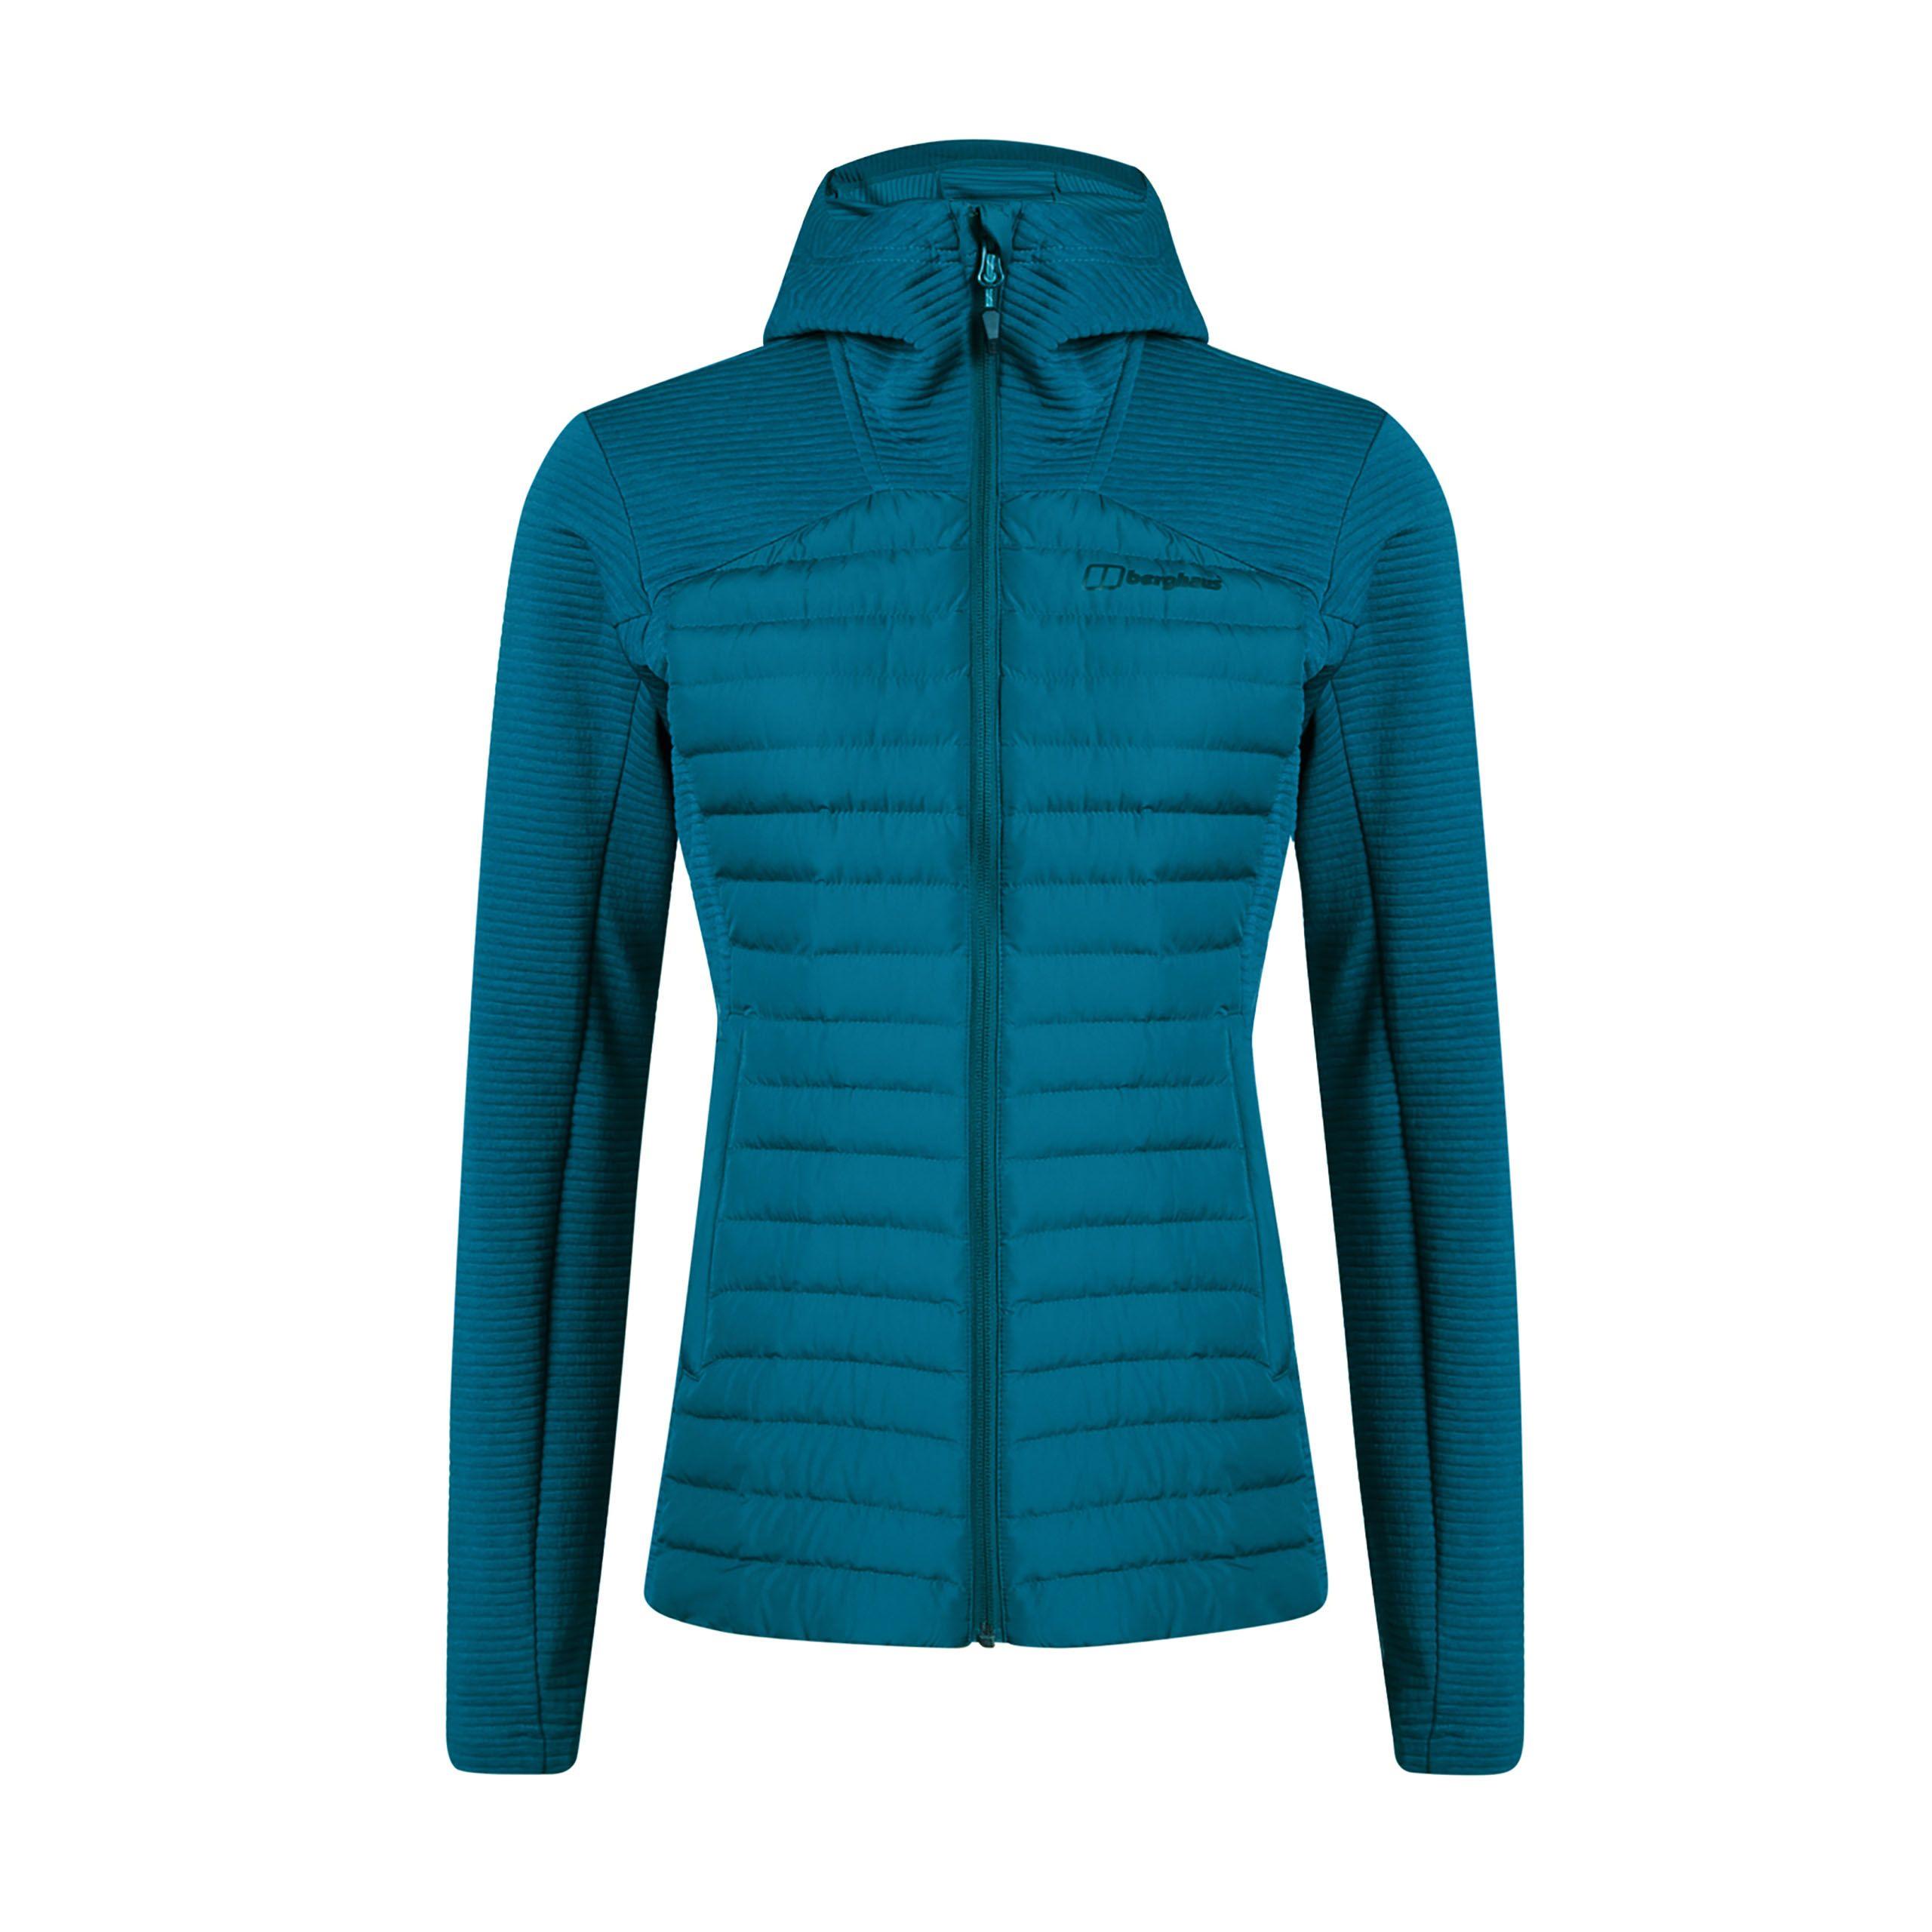 Berghaus Womens Nula Hybrid Insulated Jacket